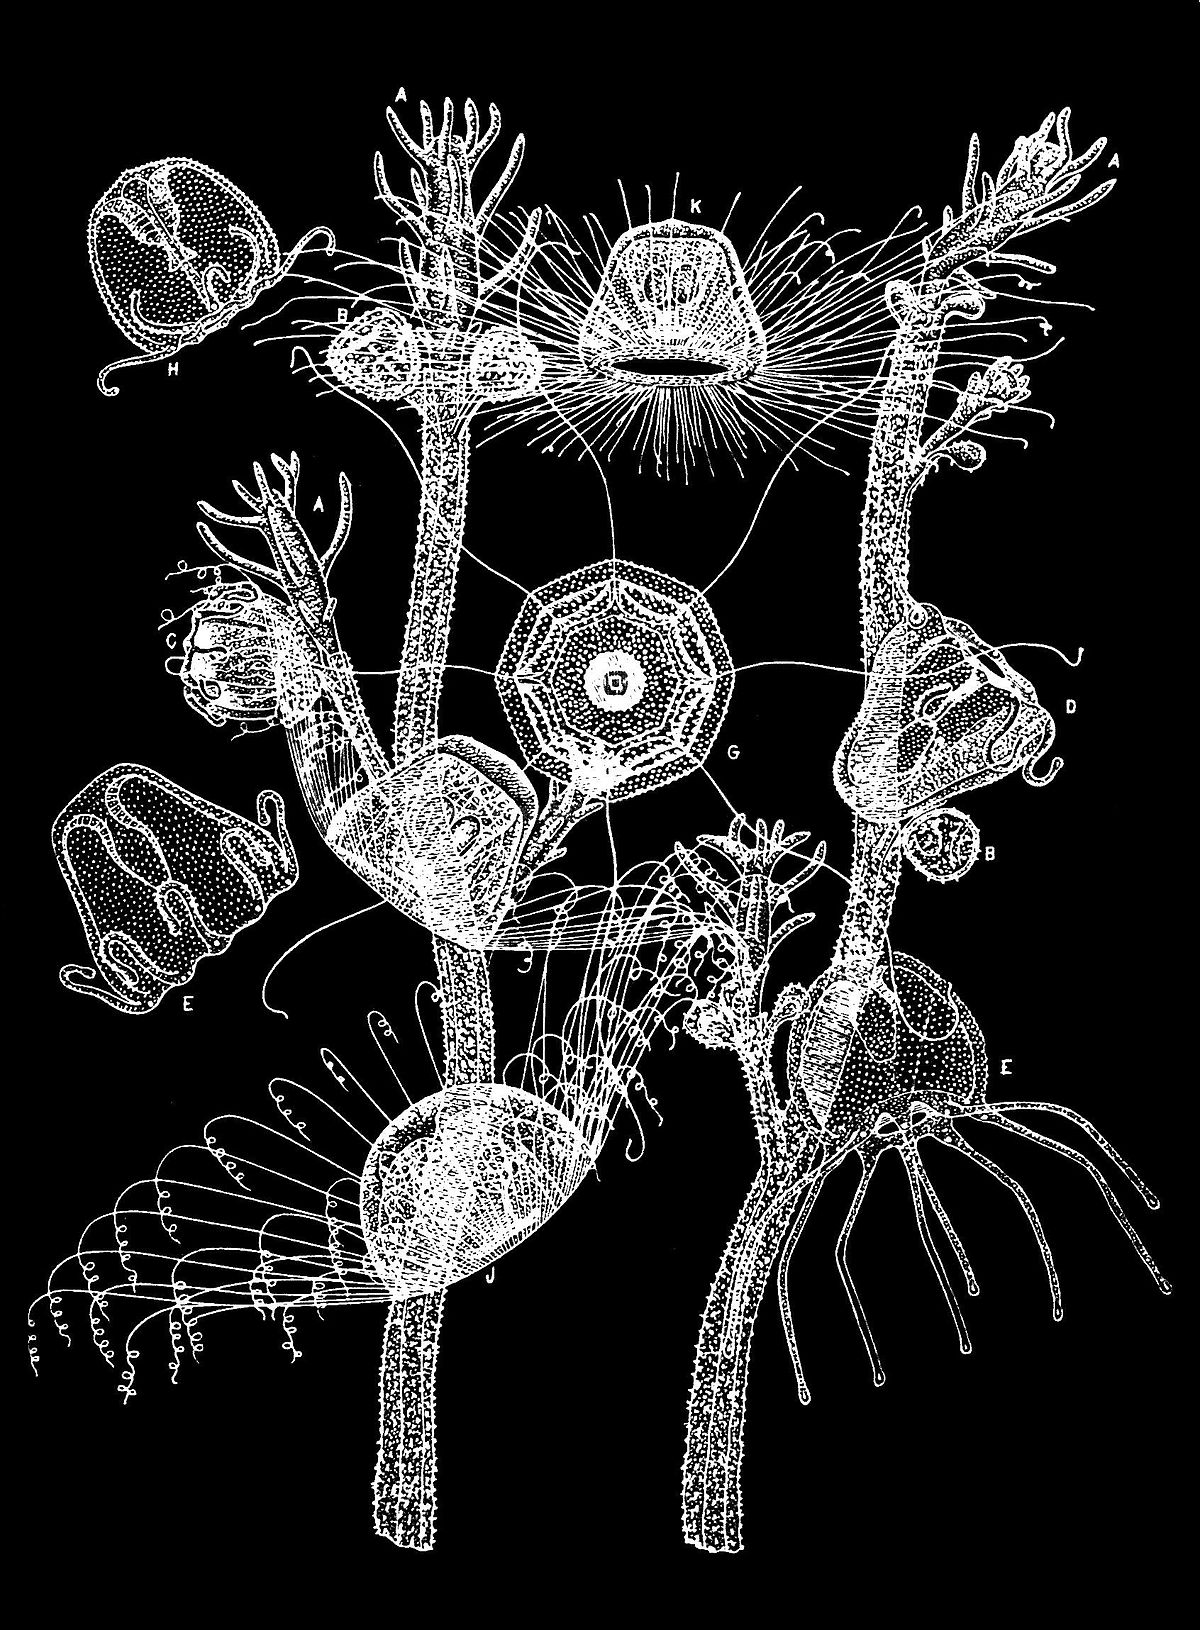 turritopsis dohrnii